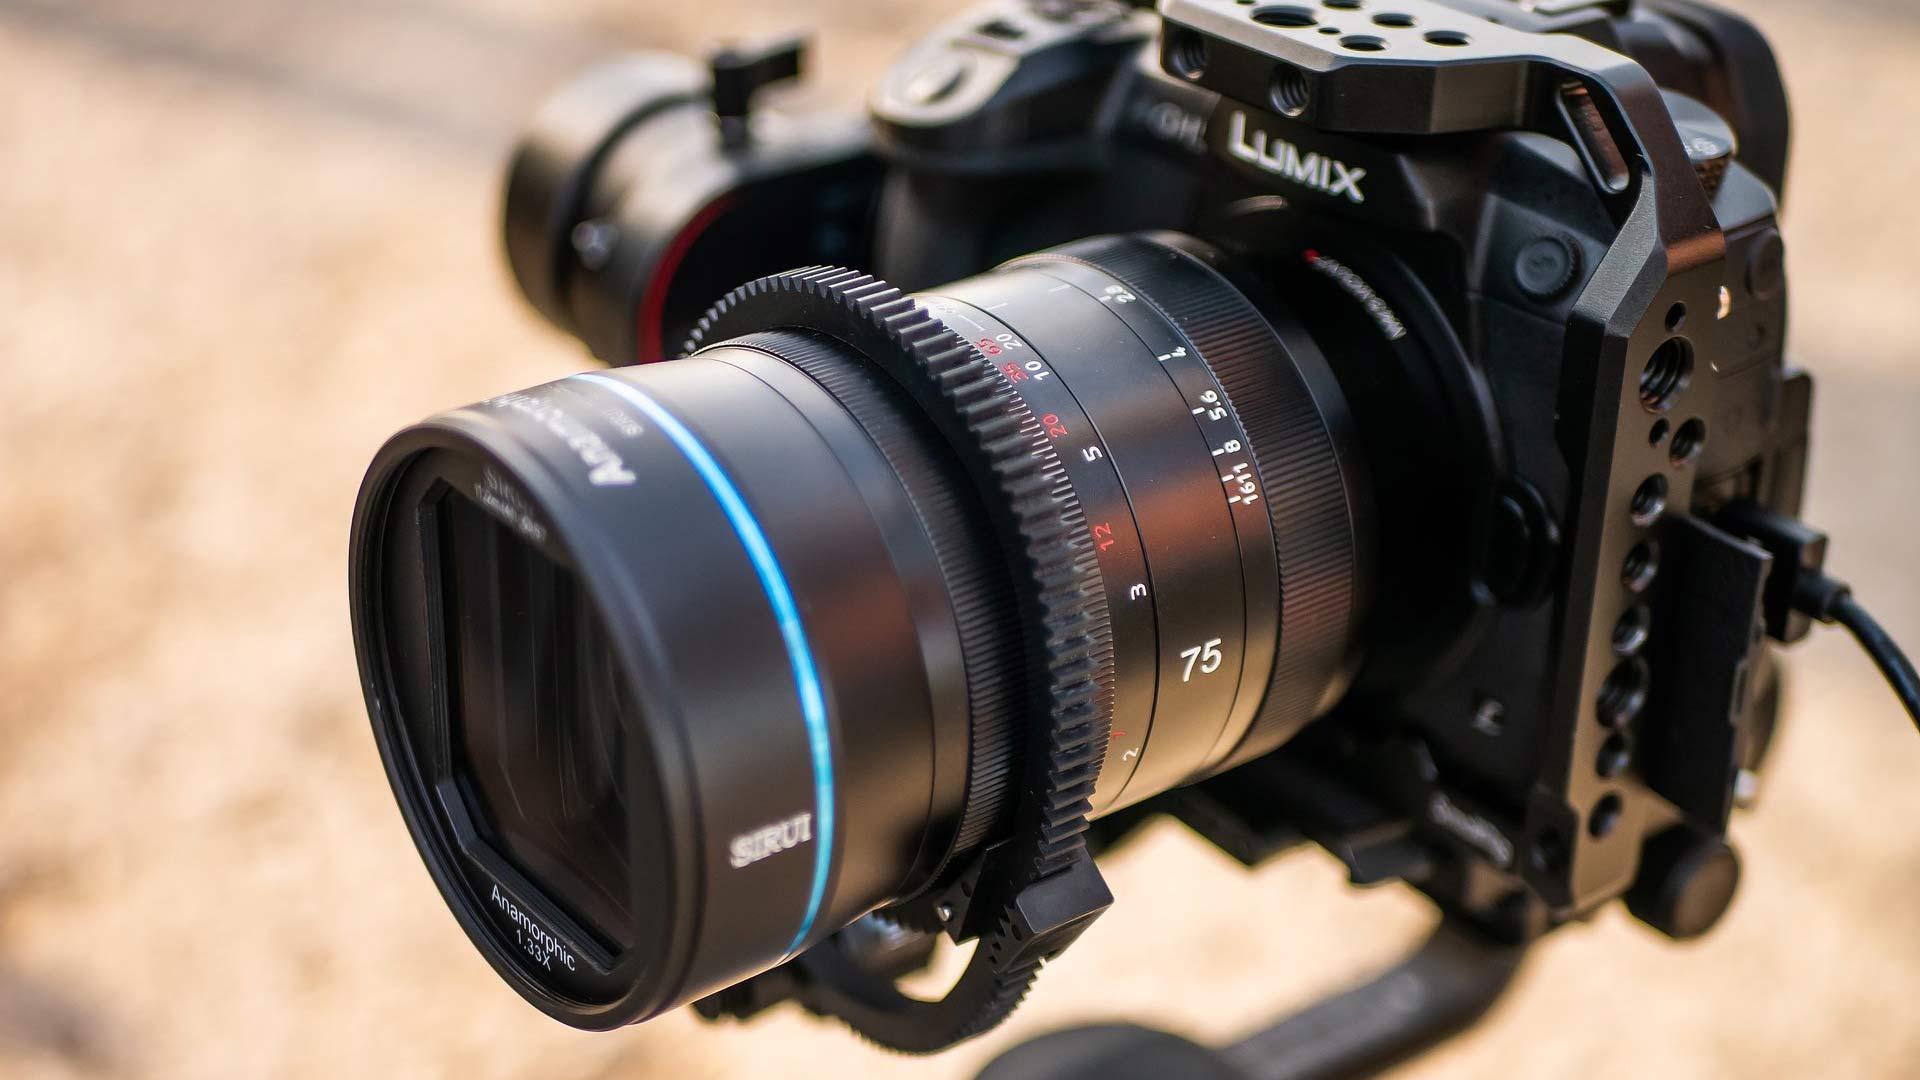 The SIRUI 75mm F1.8 1.33x anamorphic lens. Image: Sirui.